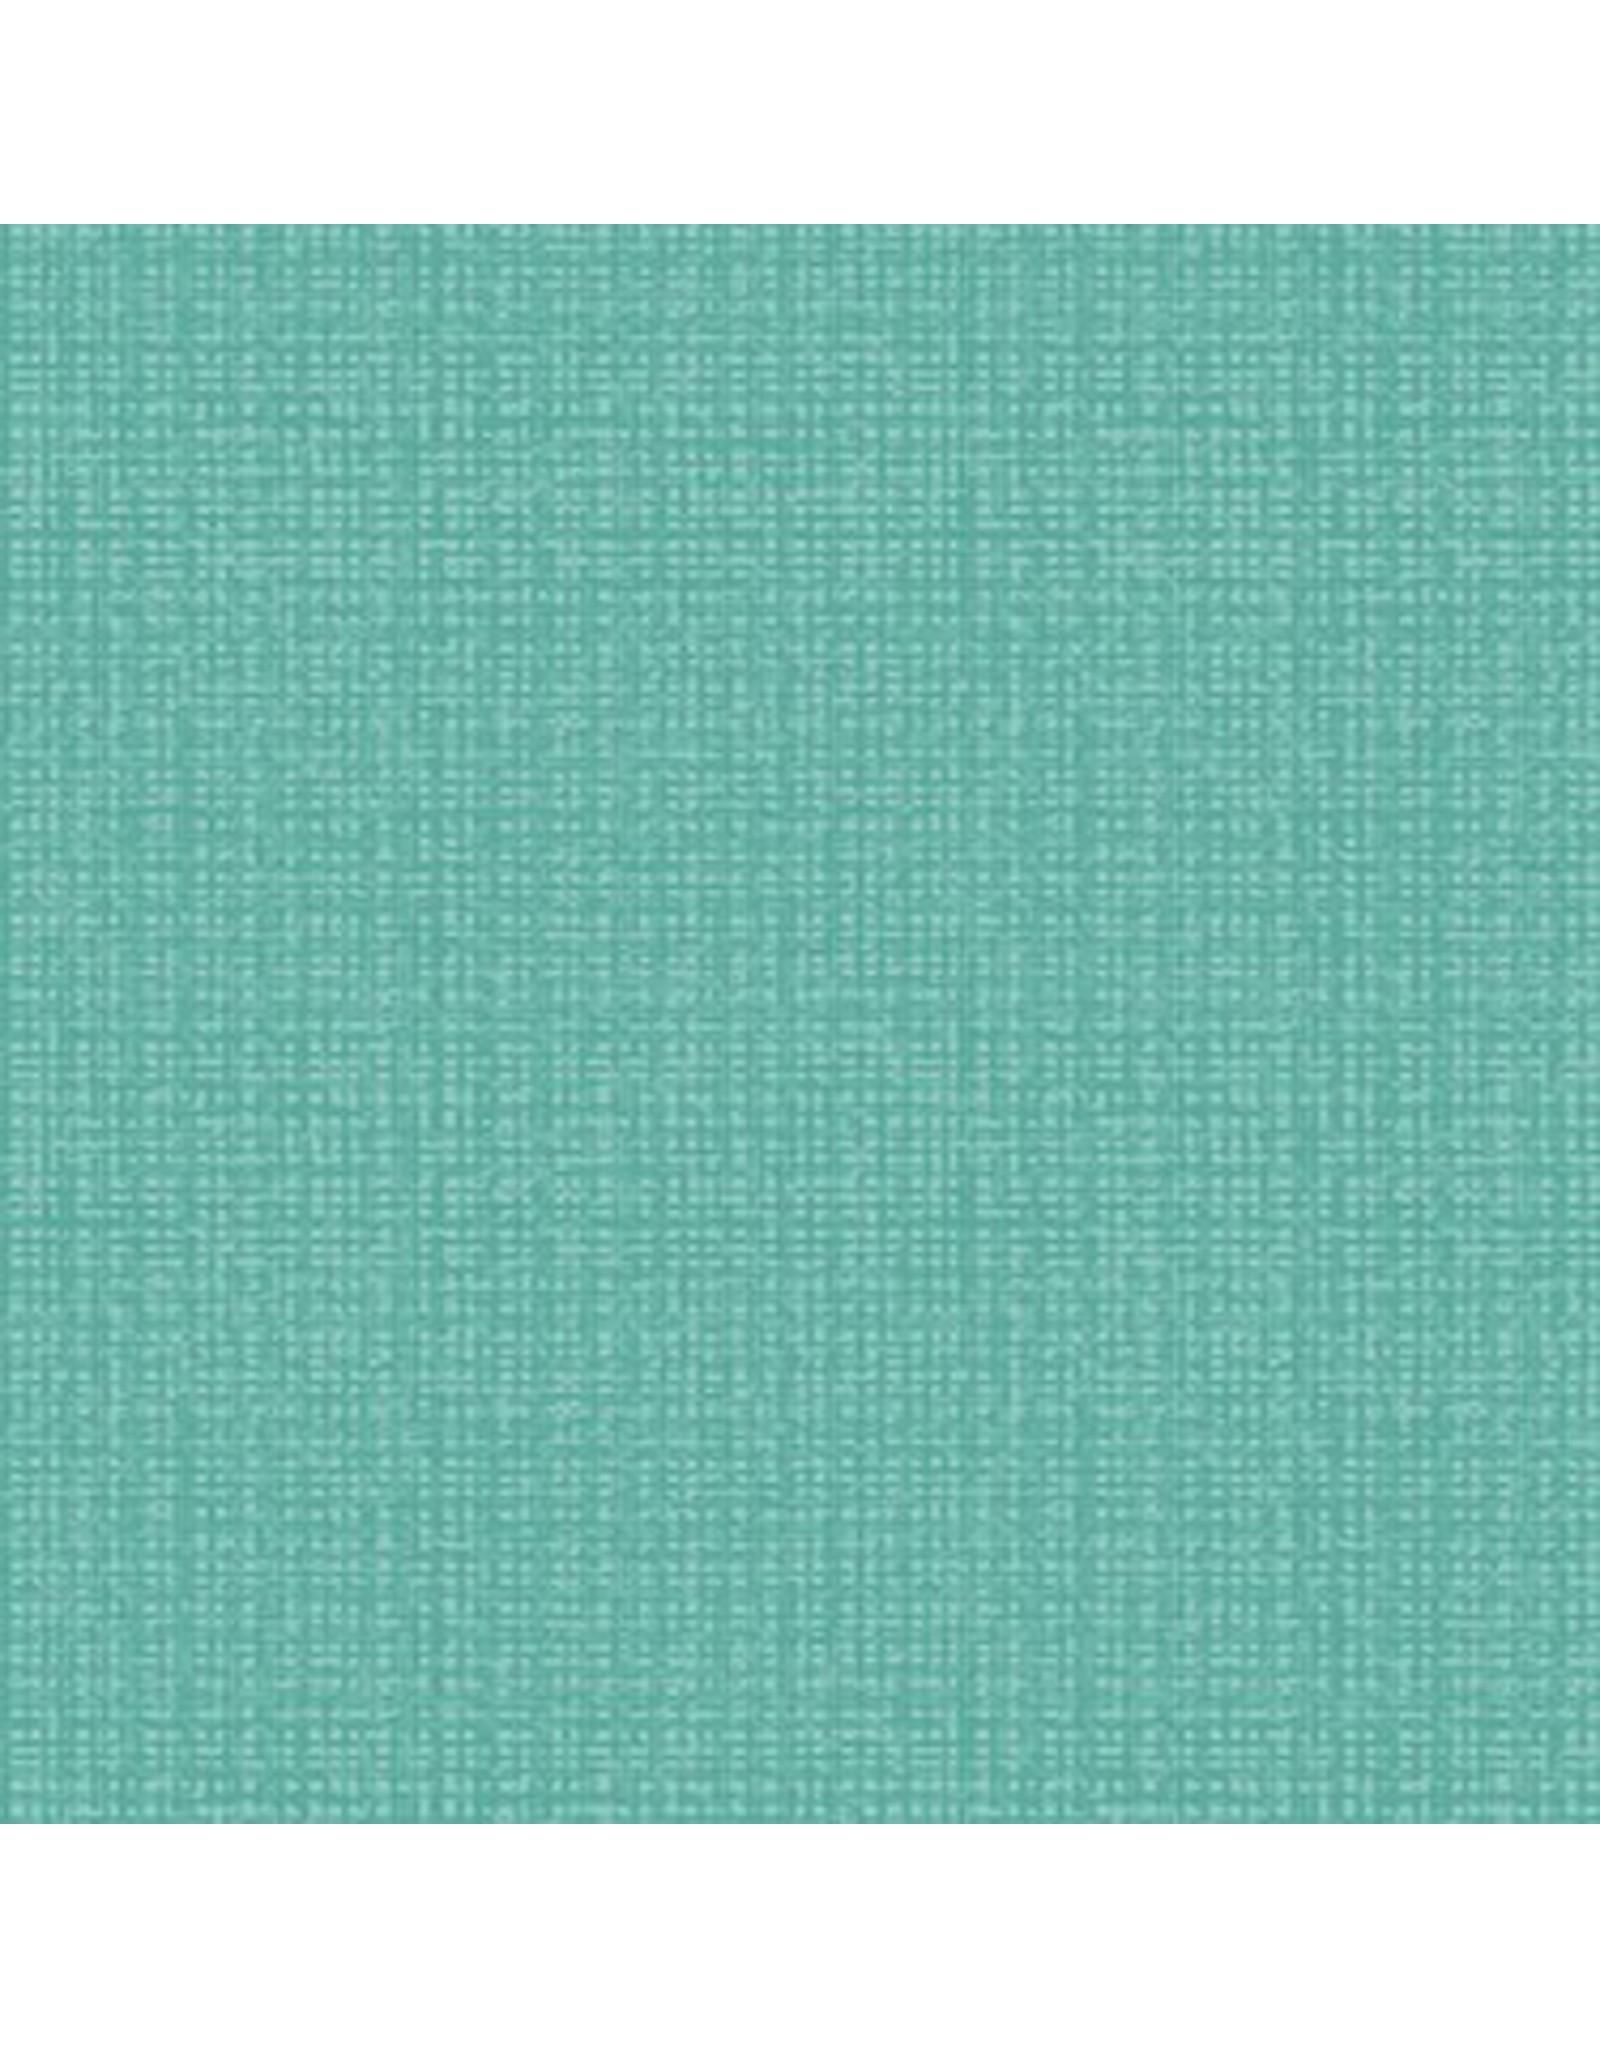 Contempo Color Weave - Turquoise